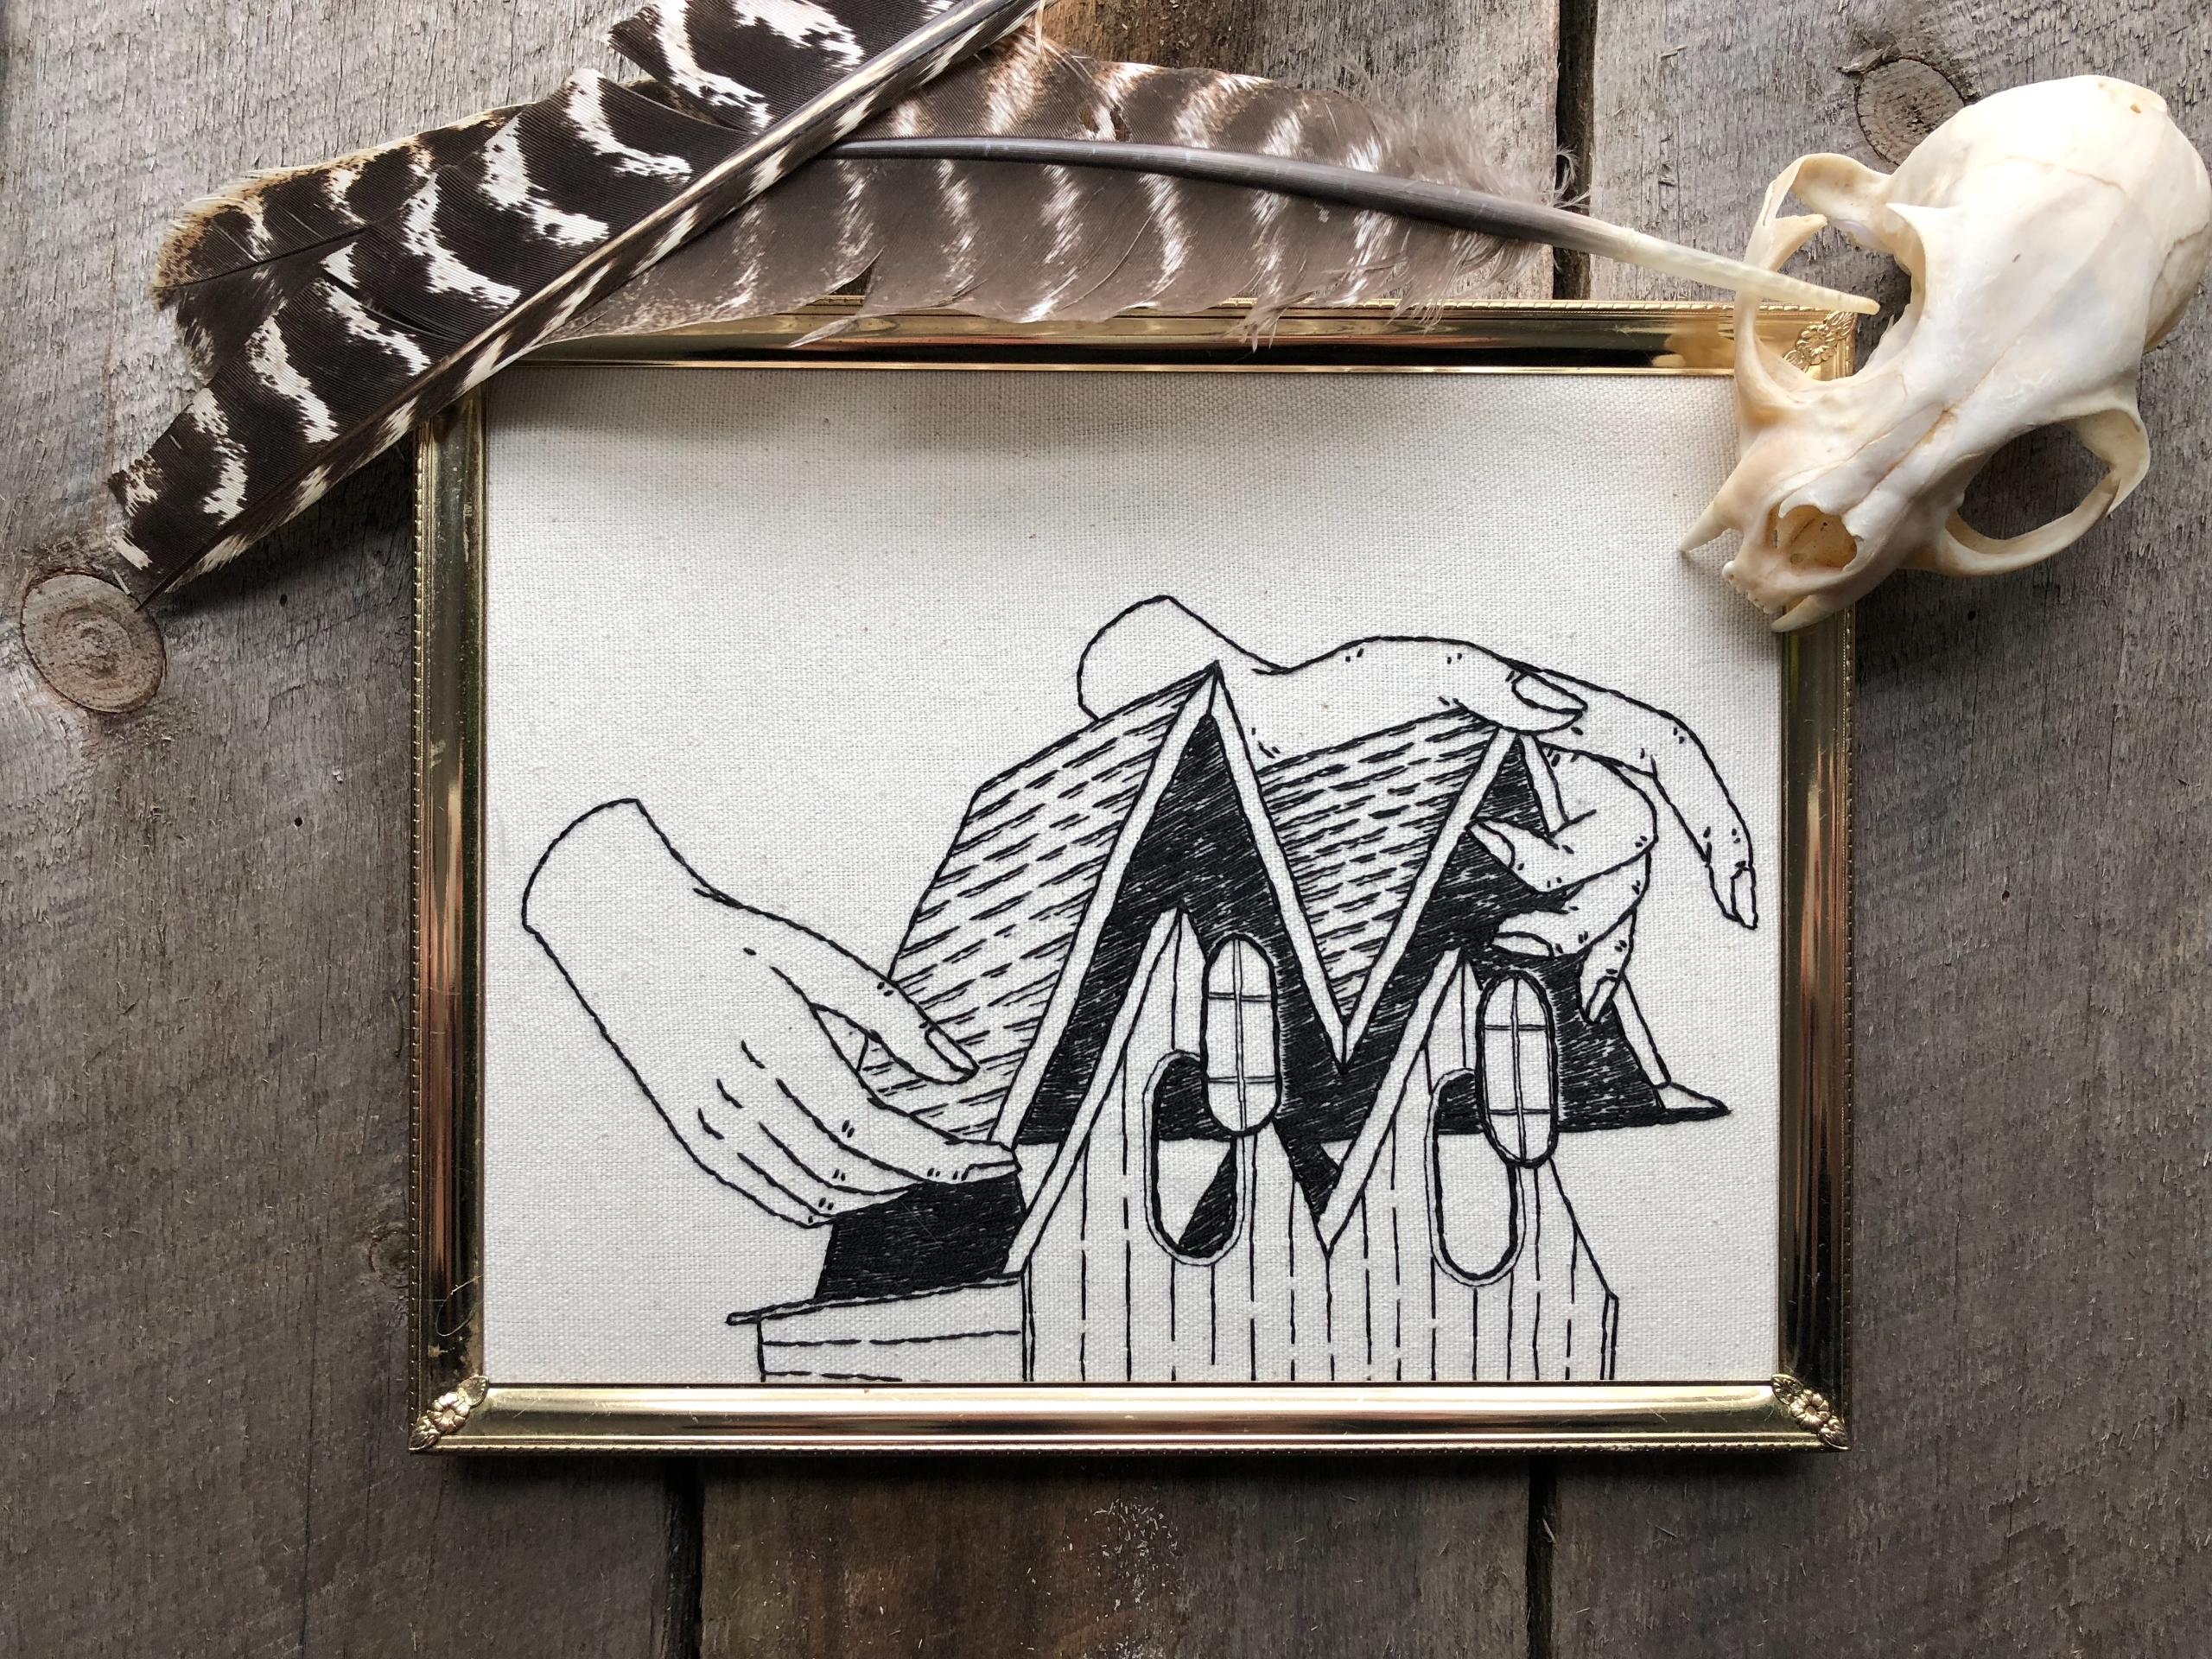 Slightly haunted - embroidery, fiberarts - spookyghoul | ello